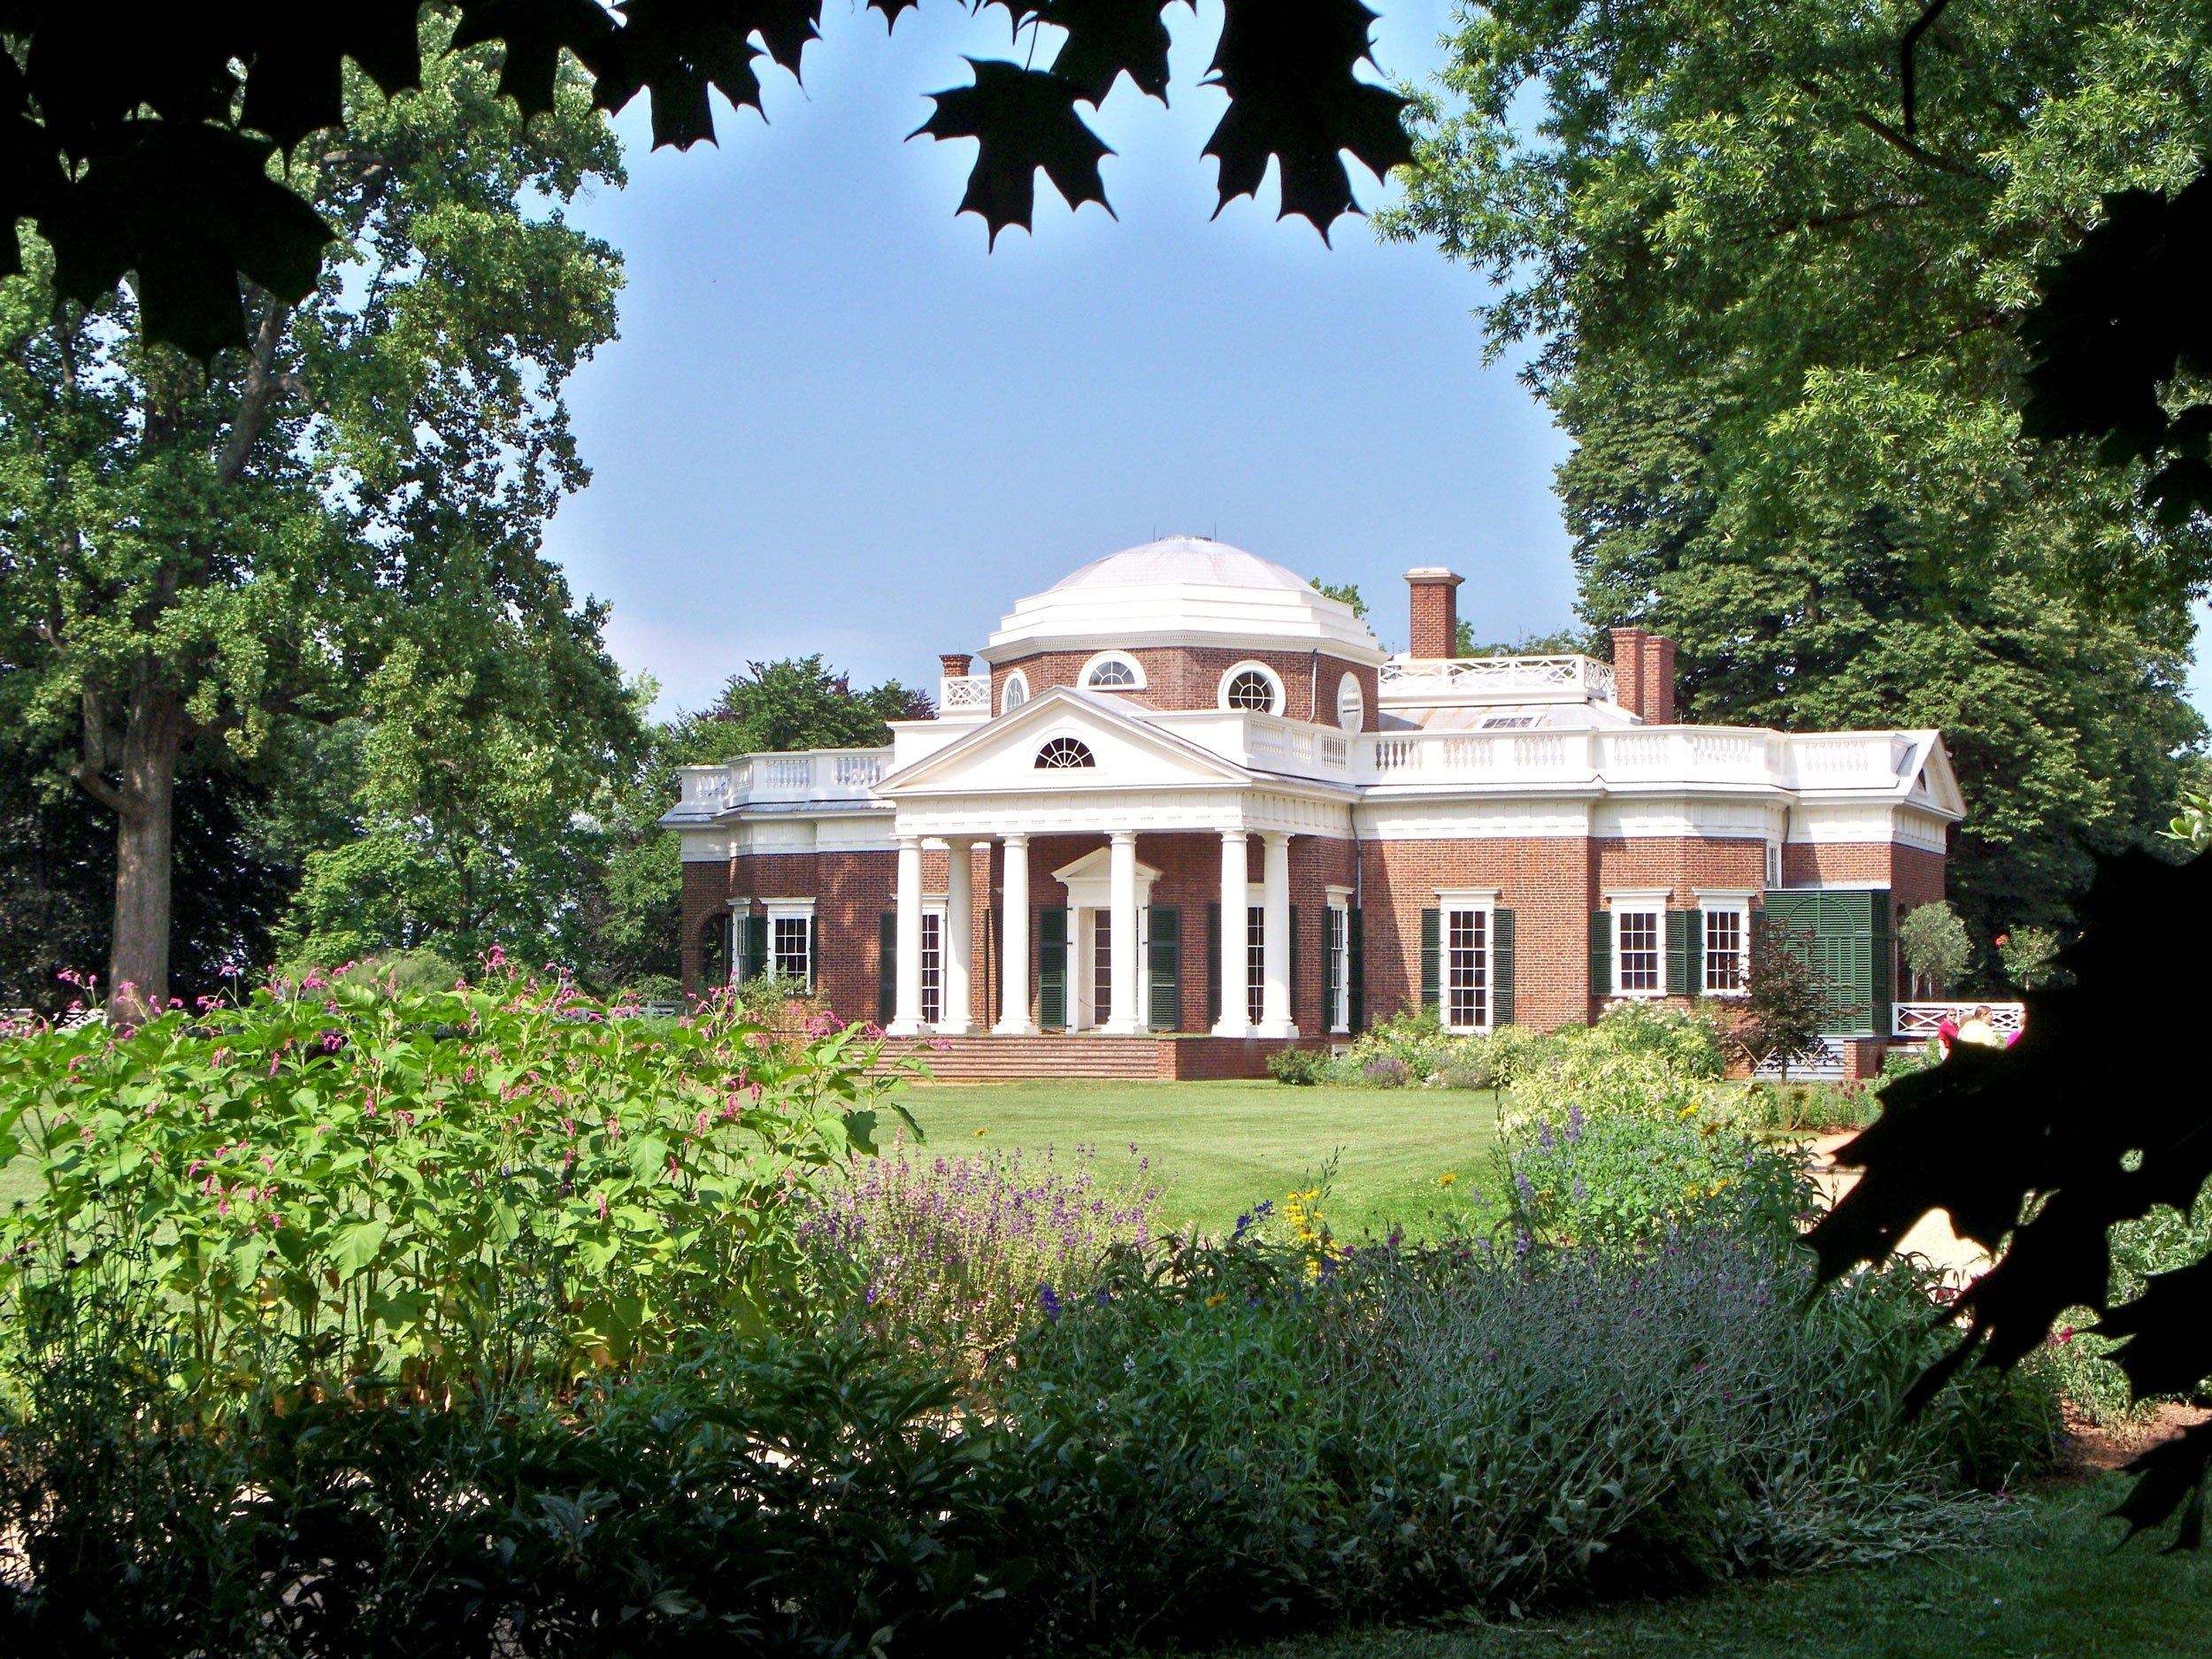 Monticello in Charlottesville Virginia | 2 Week Virginia Road Trip from Washington DC